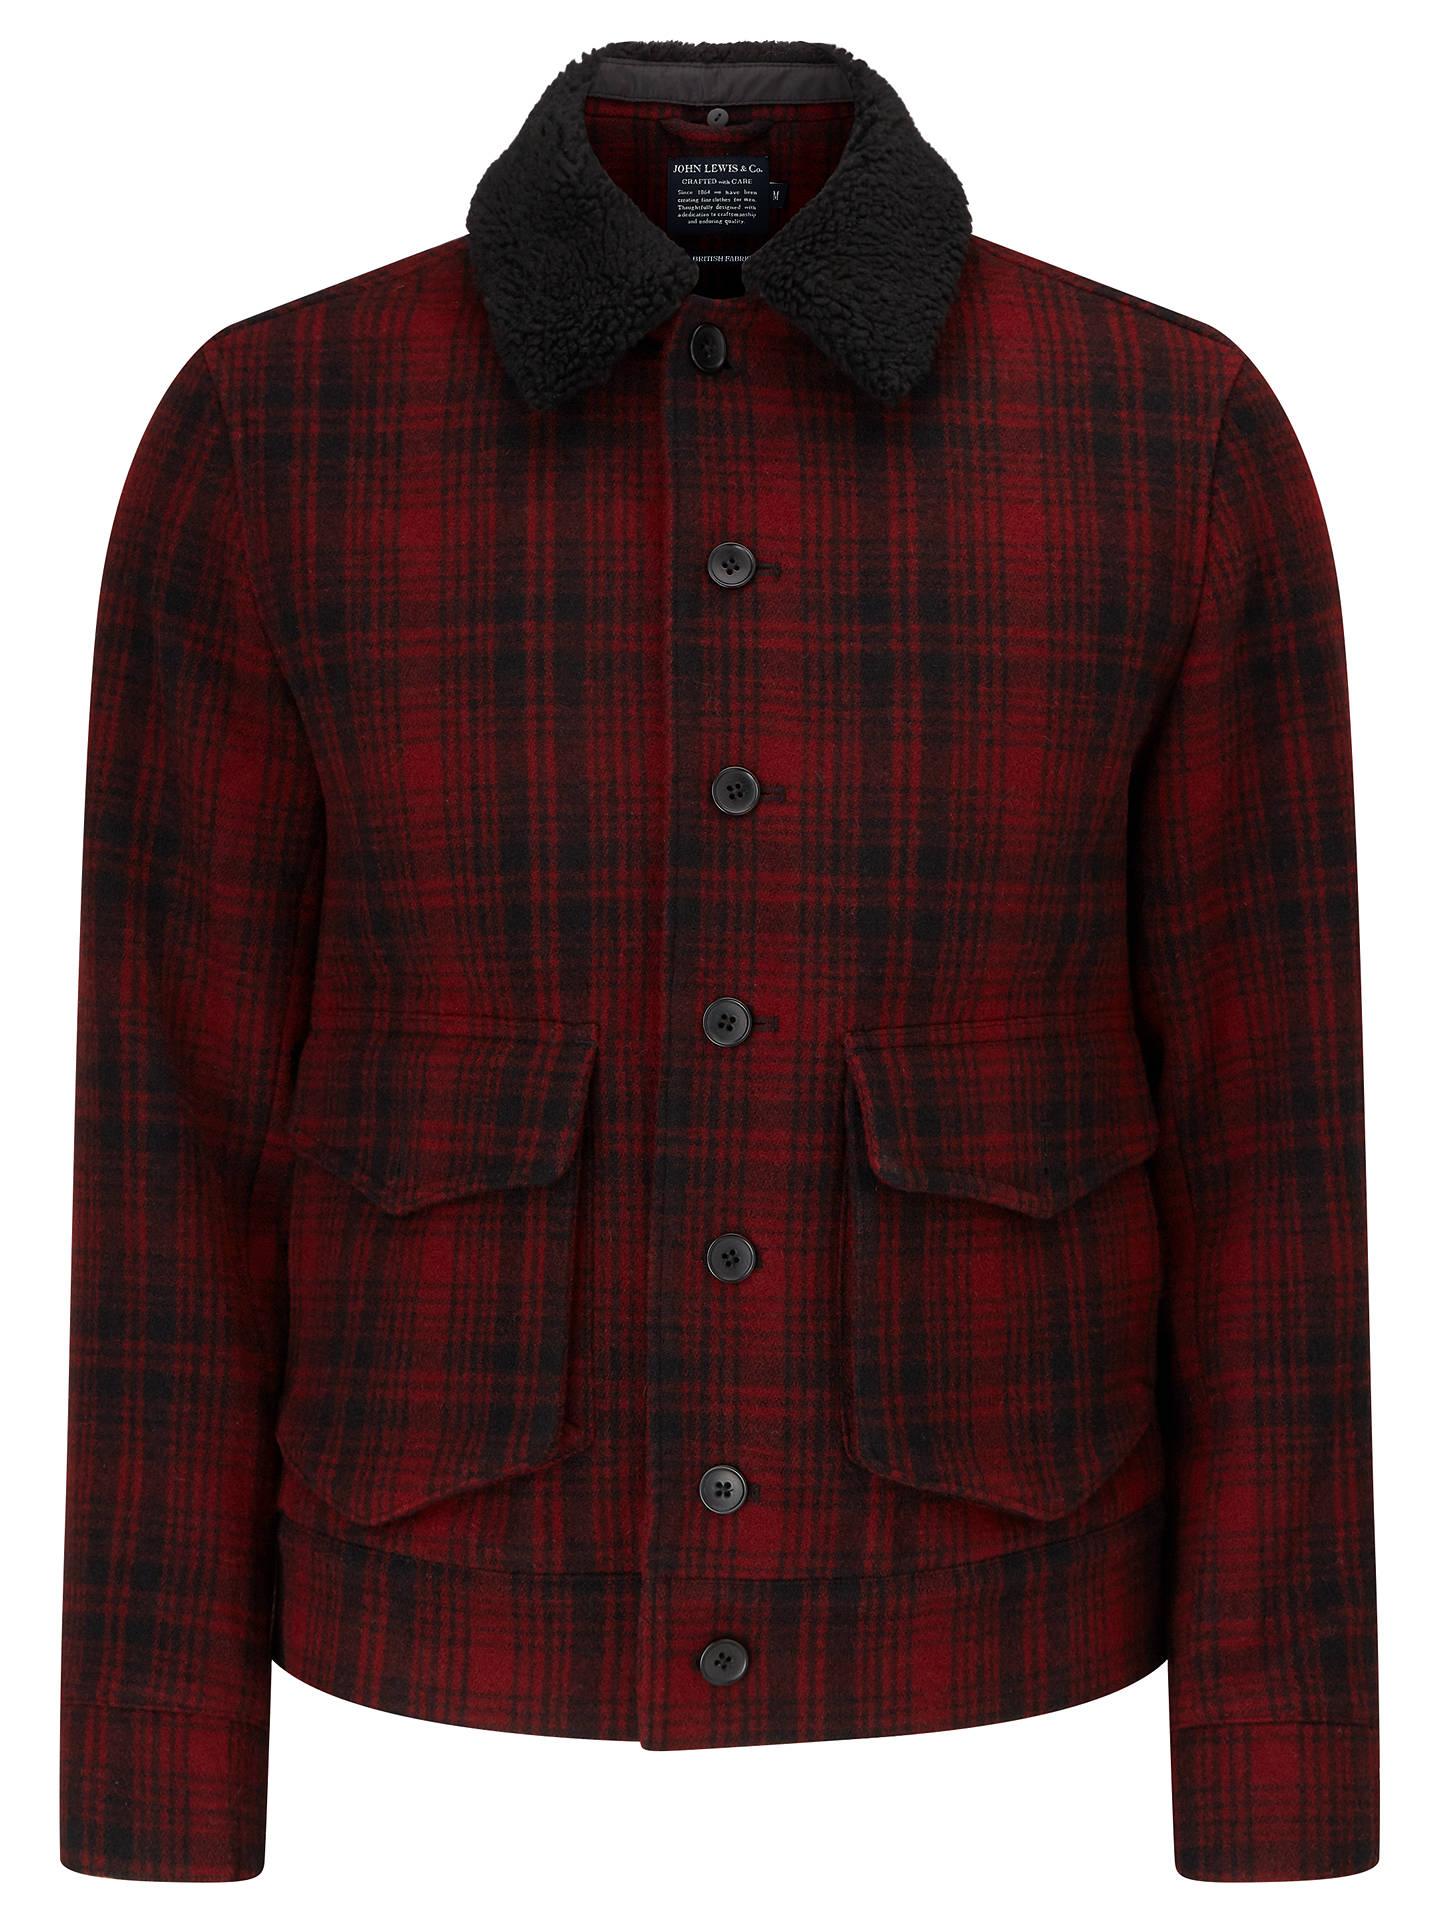 gitz-johansen lumber jacket